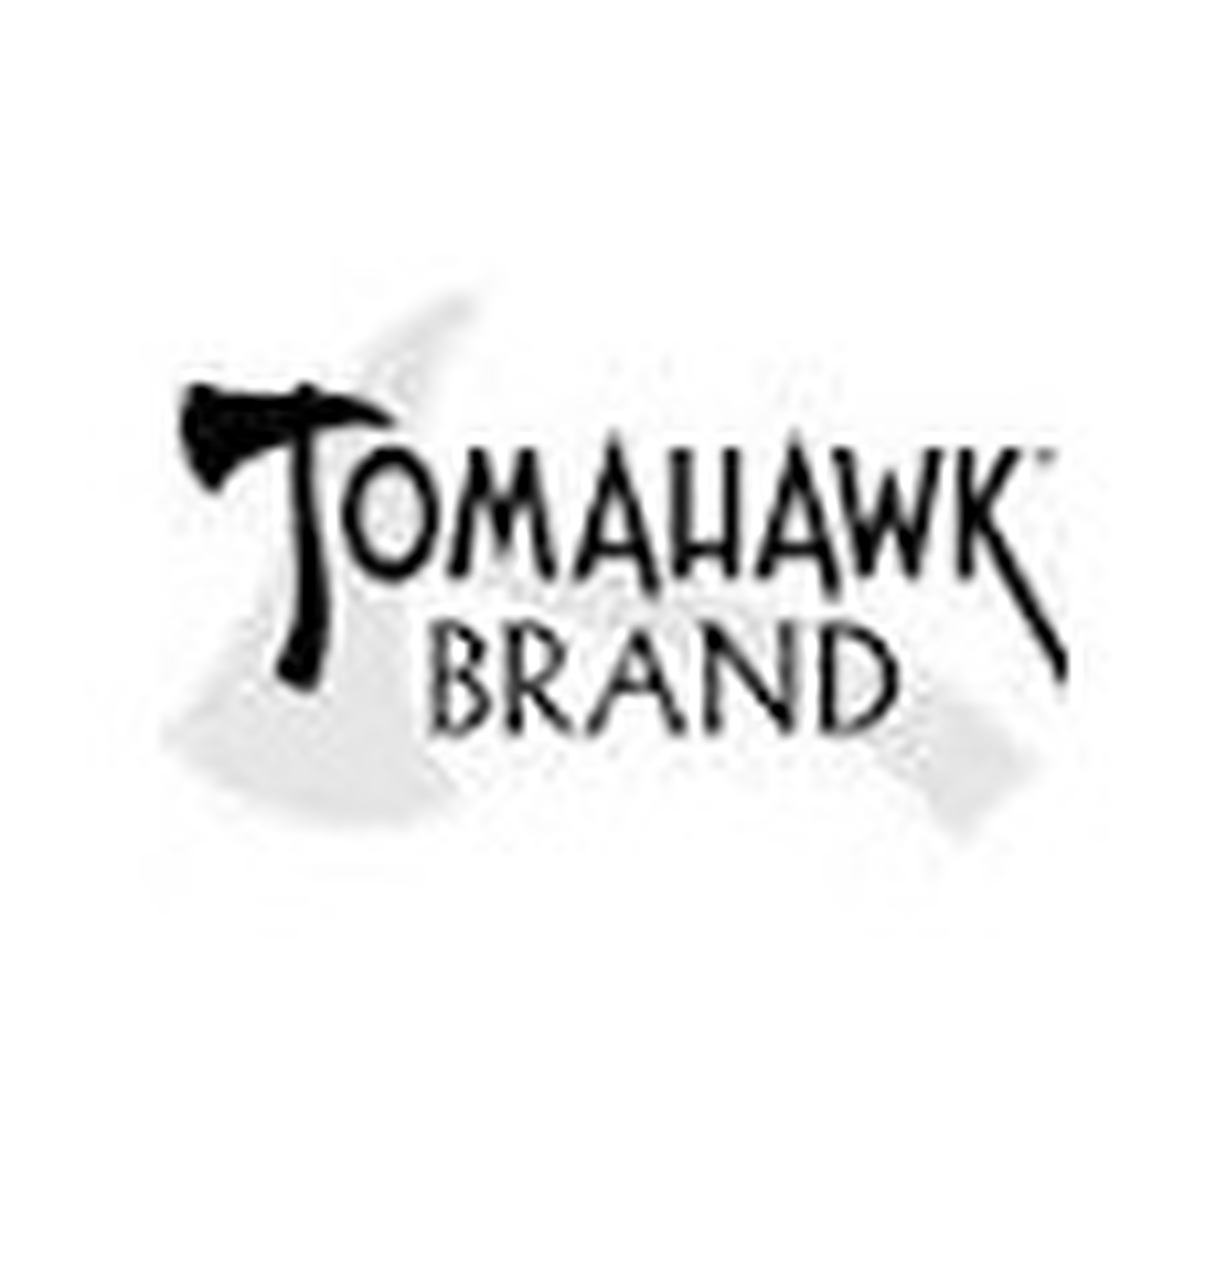 Tomahawk Brand